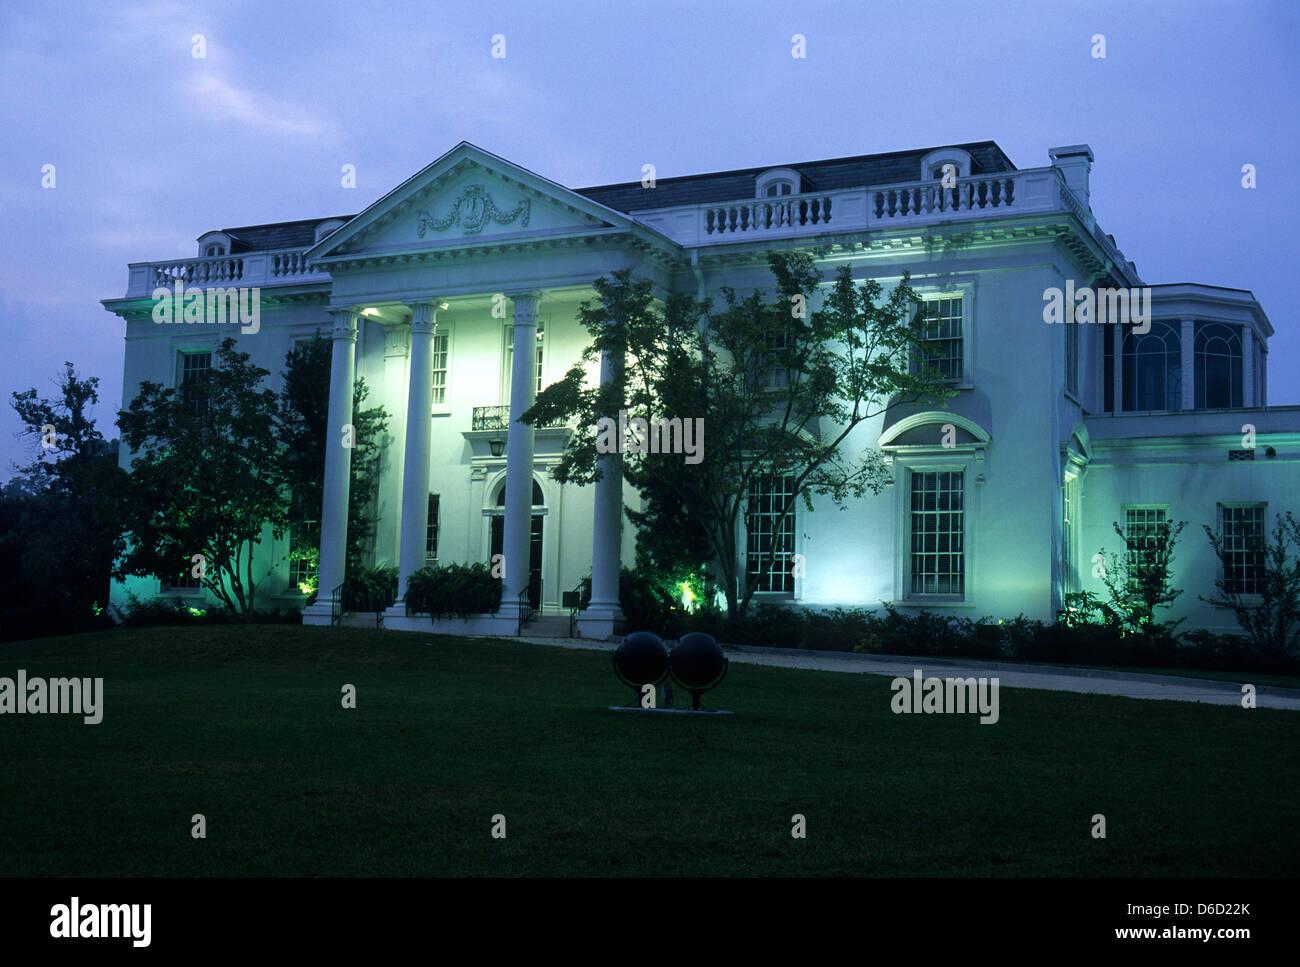 Elk283-1096 Louisiana, Baton Rouge, Old Governor's Mansion, 1930 - Stock Image